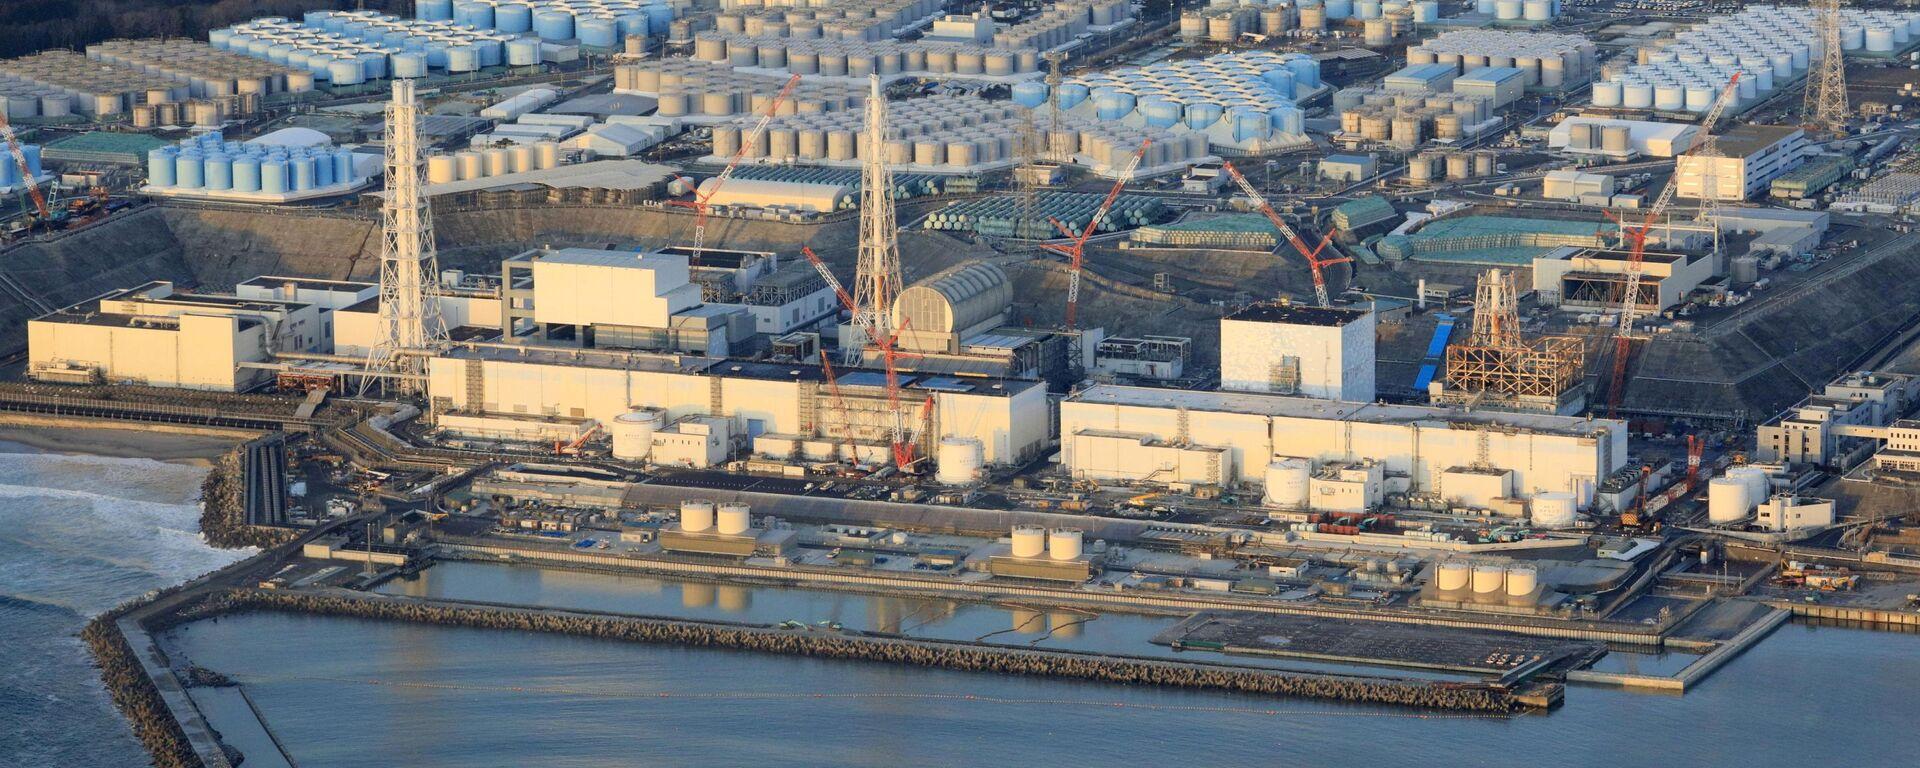 Fukushima Daiichi nuclear power plant in Okuma town - Sputnik International, 1920, 15.04.2021